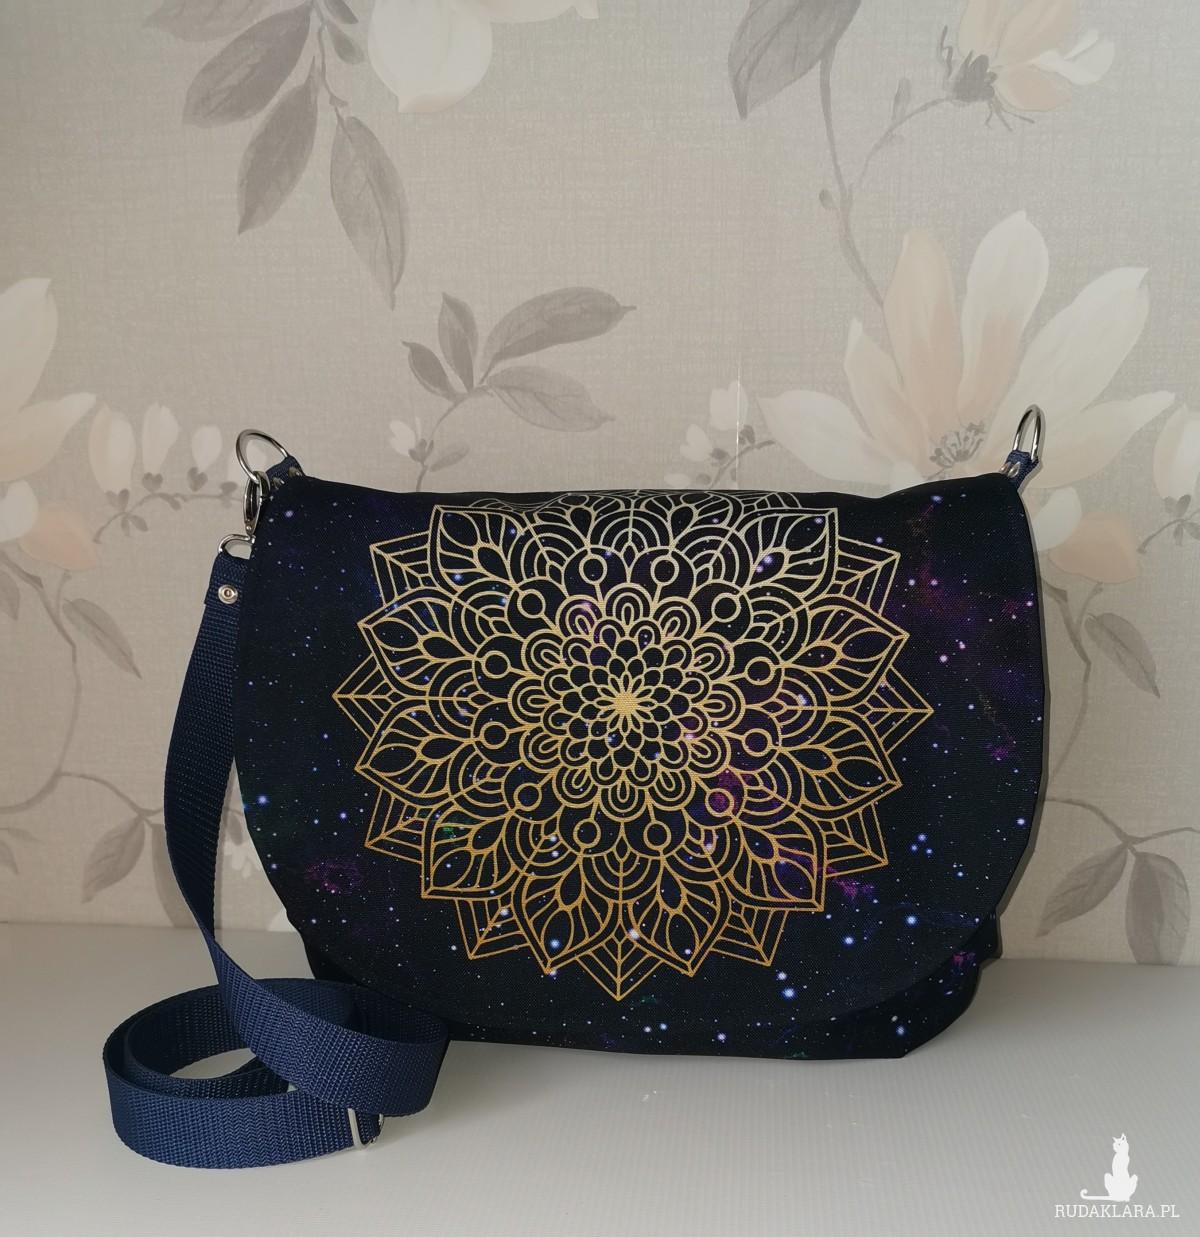 Torebka damska listonoszka torebka z klapką na ramię wodoodporna torba handmade  galaktyka